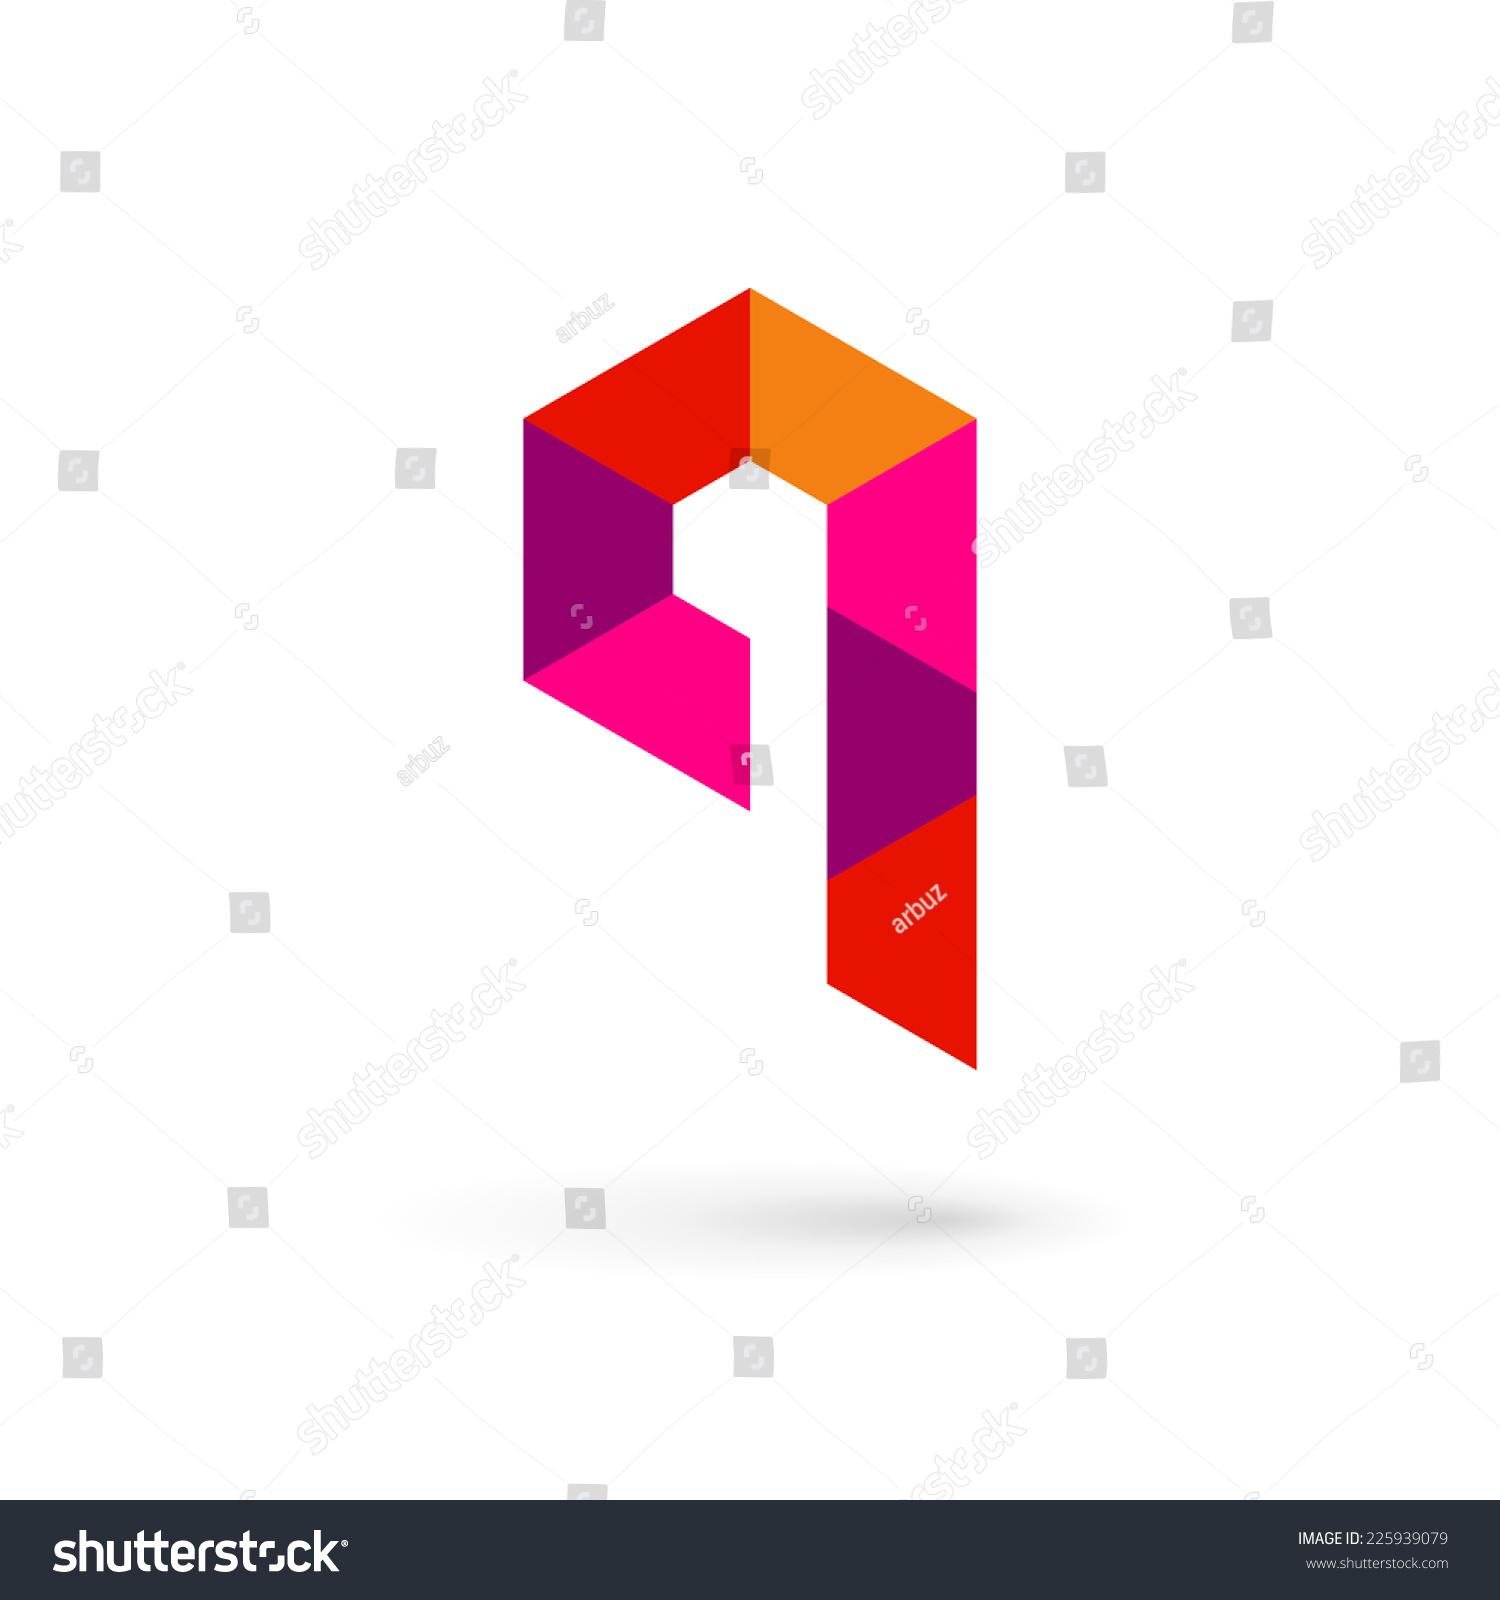 Letter Q mosaic logo icon design template elements